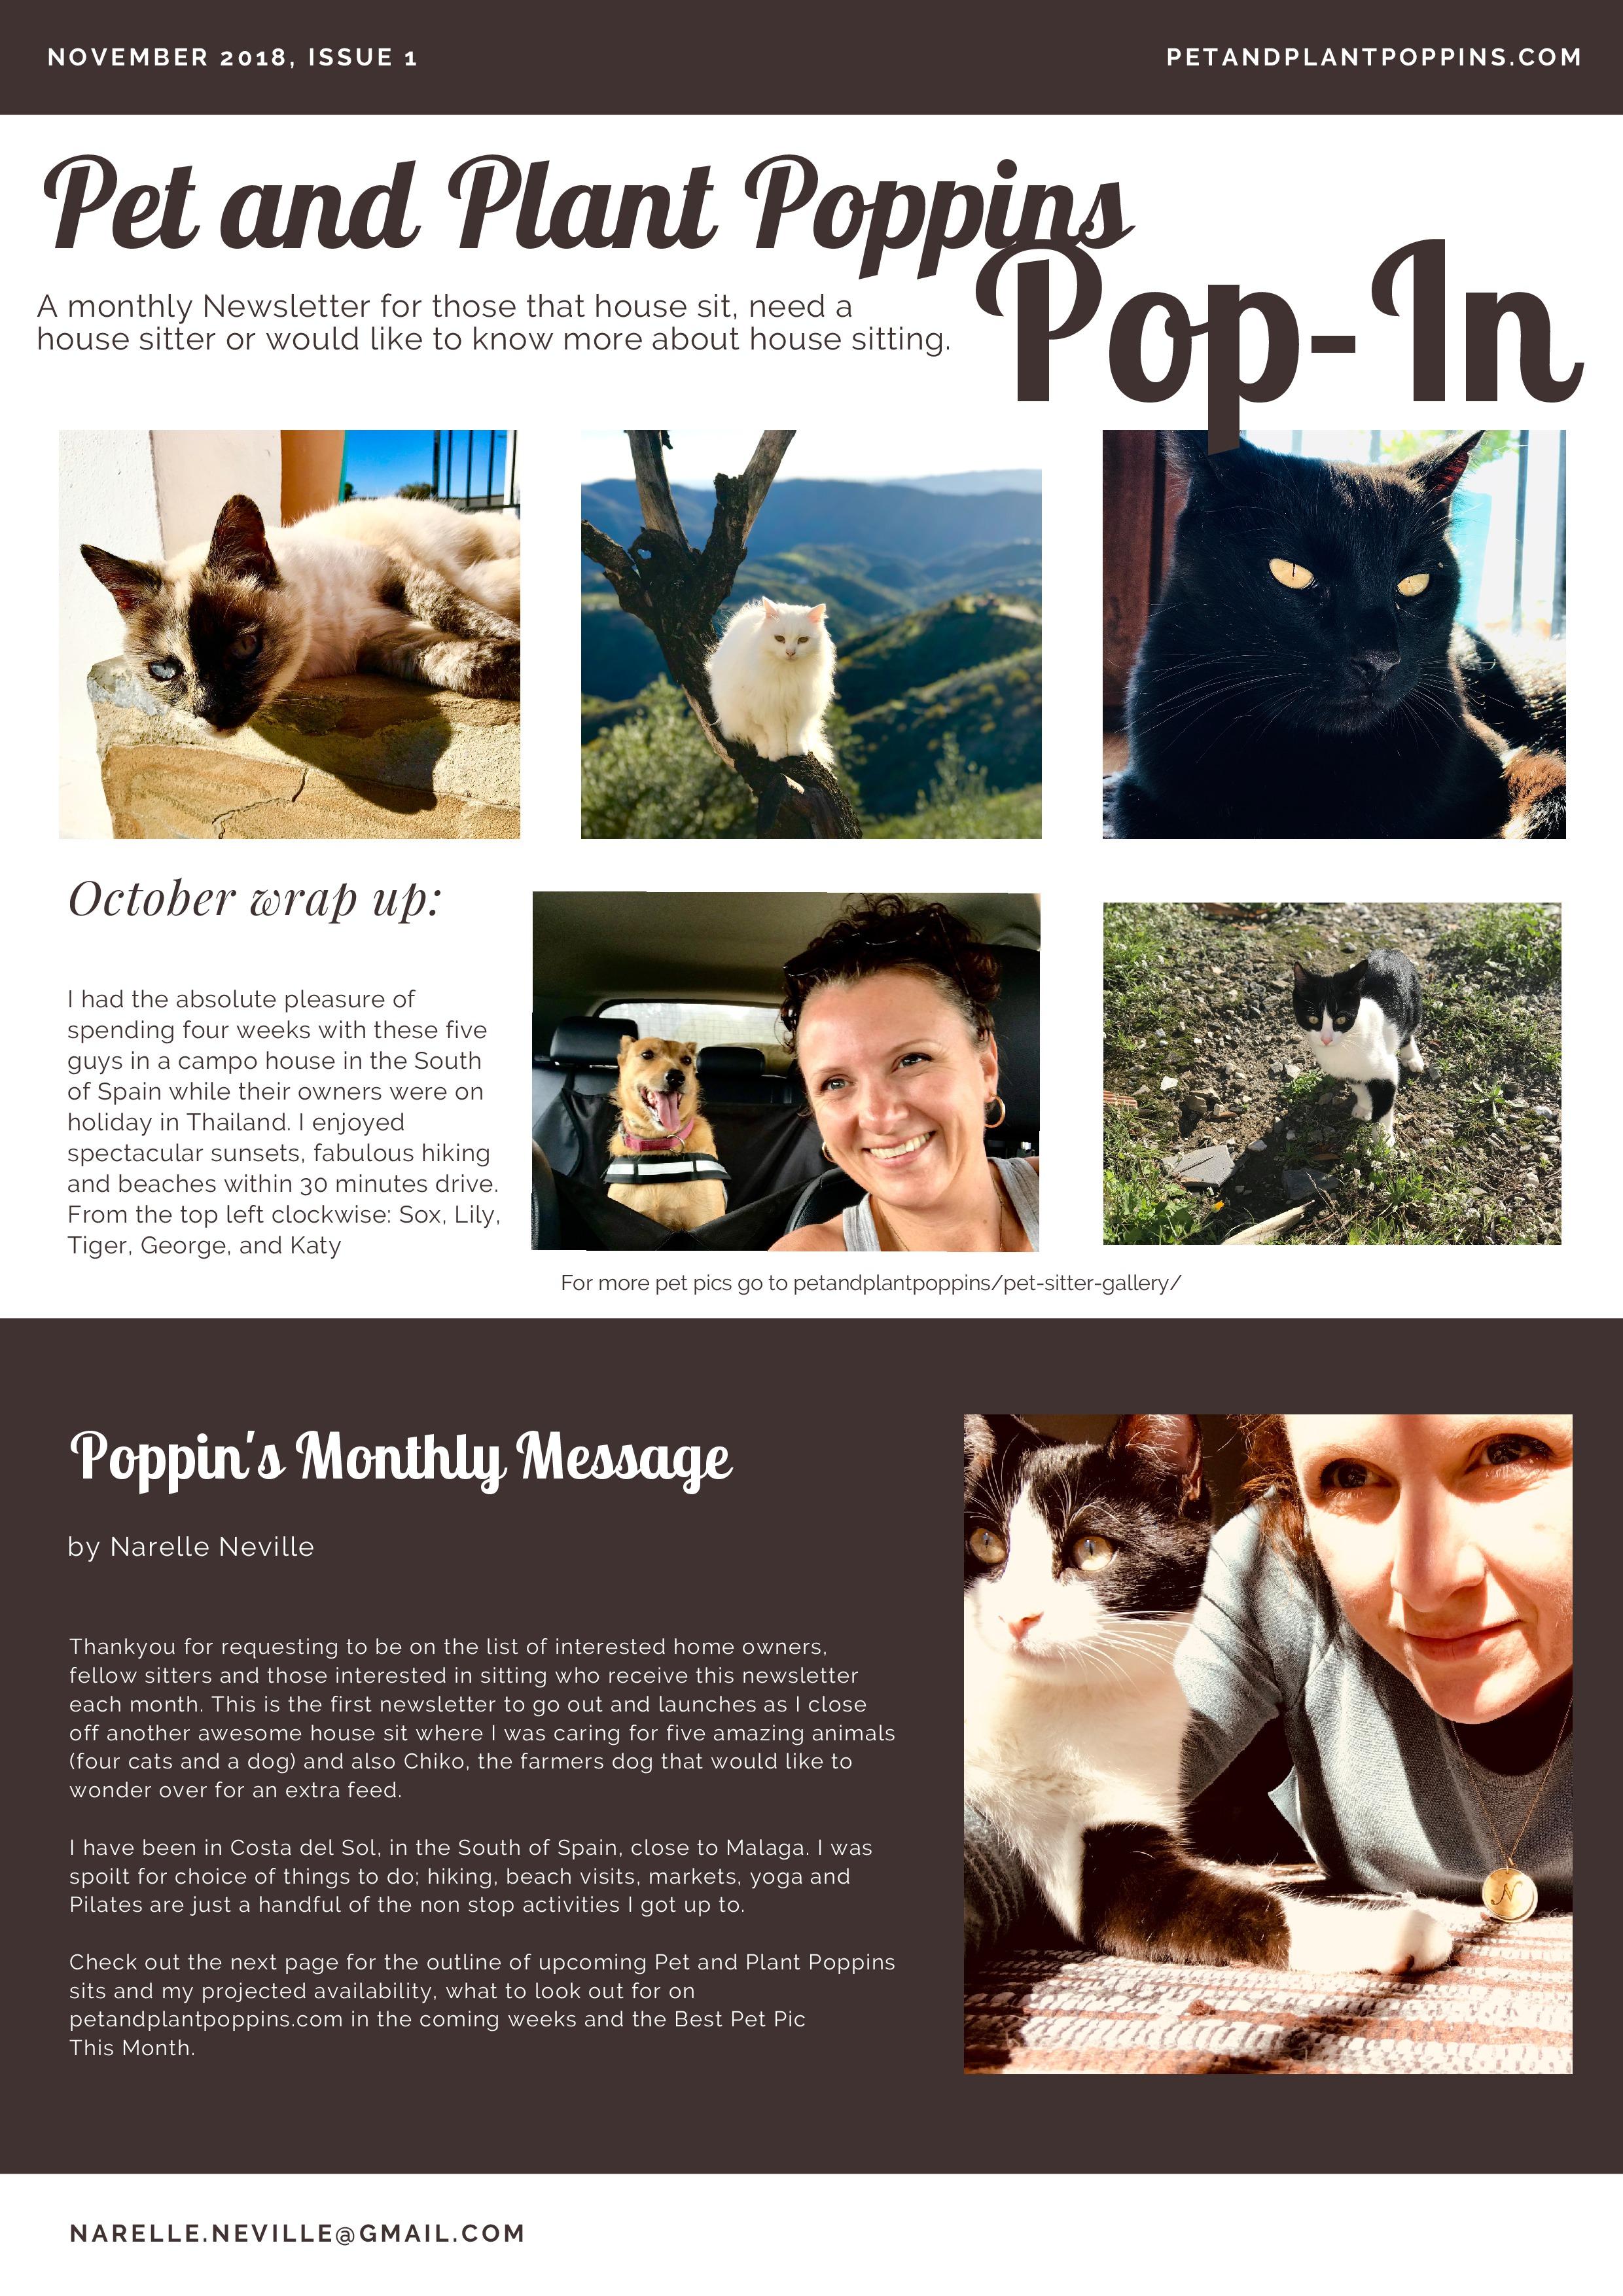 PetandPlantPoppins Email Newsletter November 2018-page-1